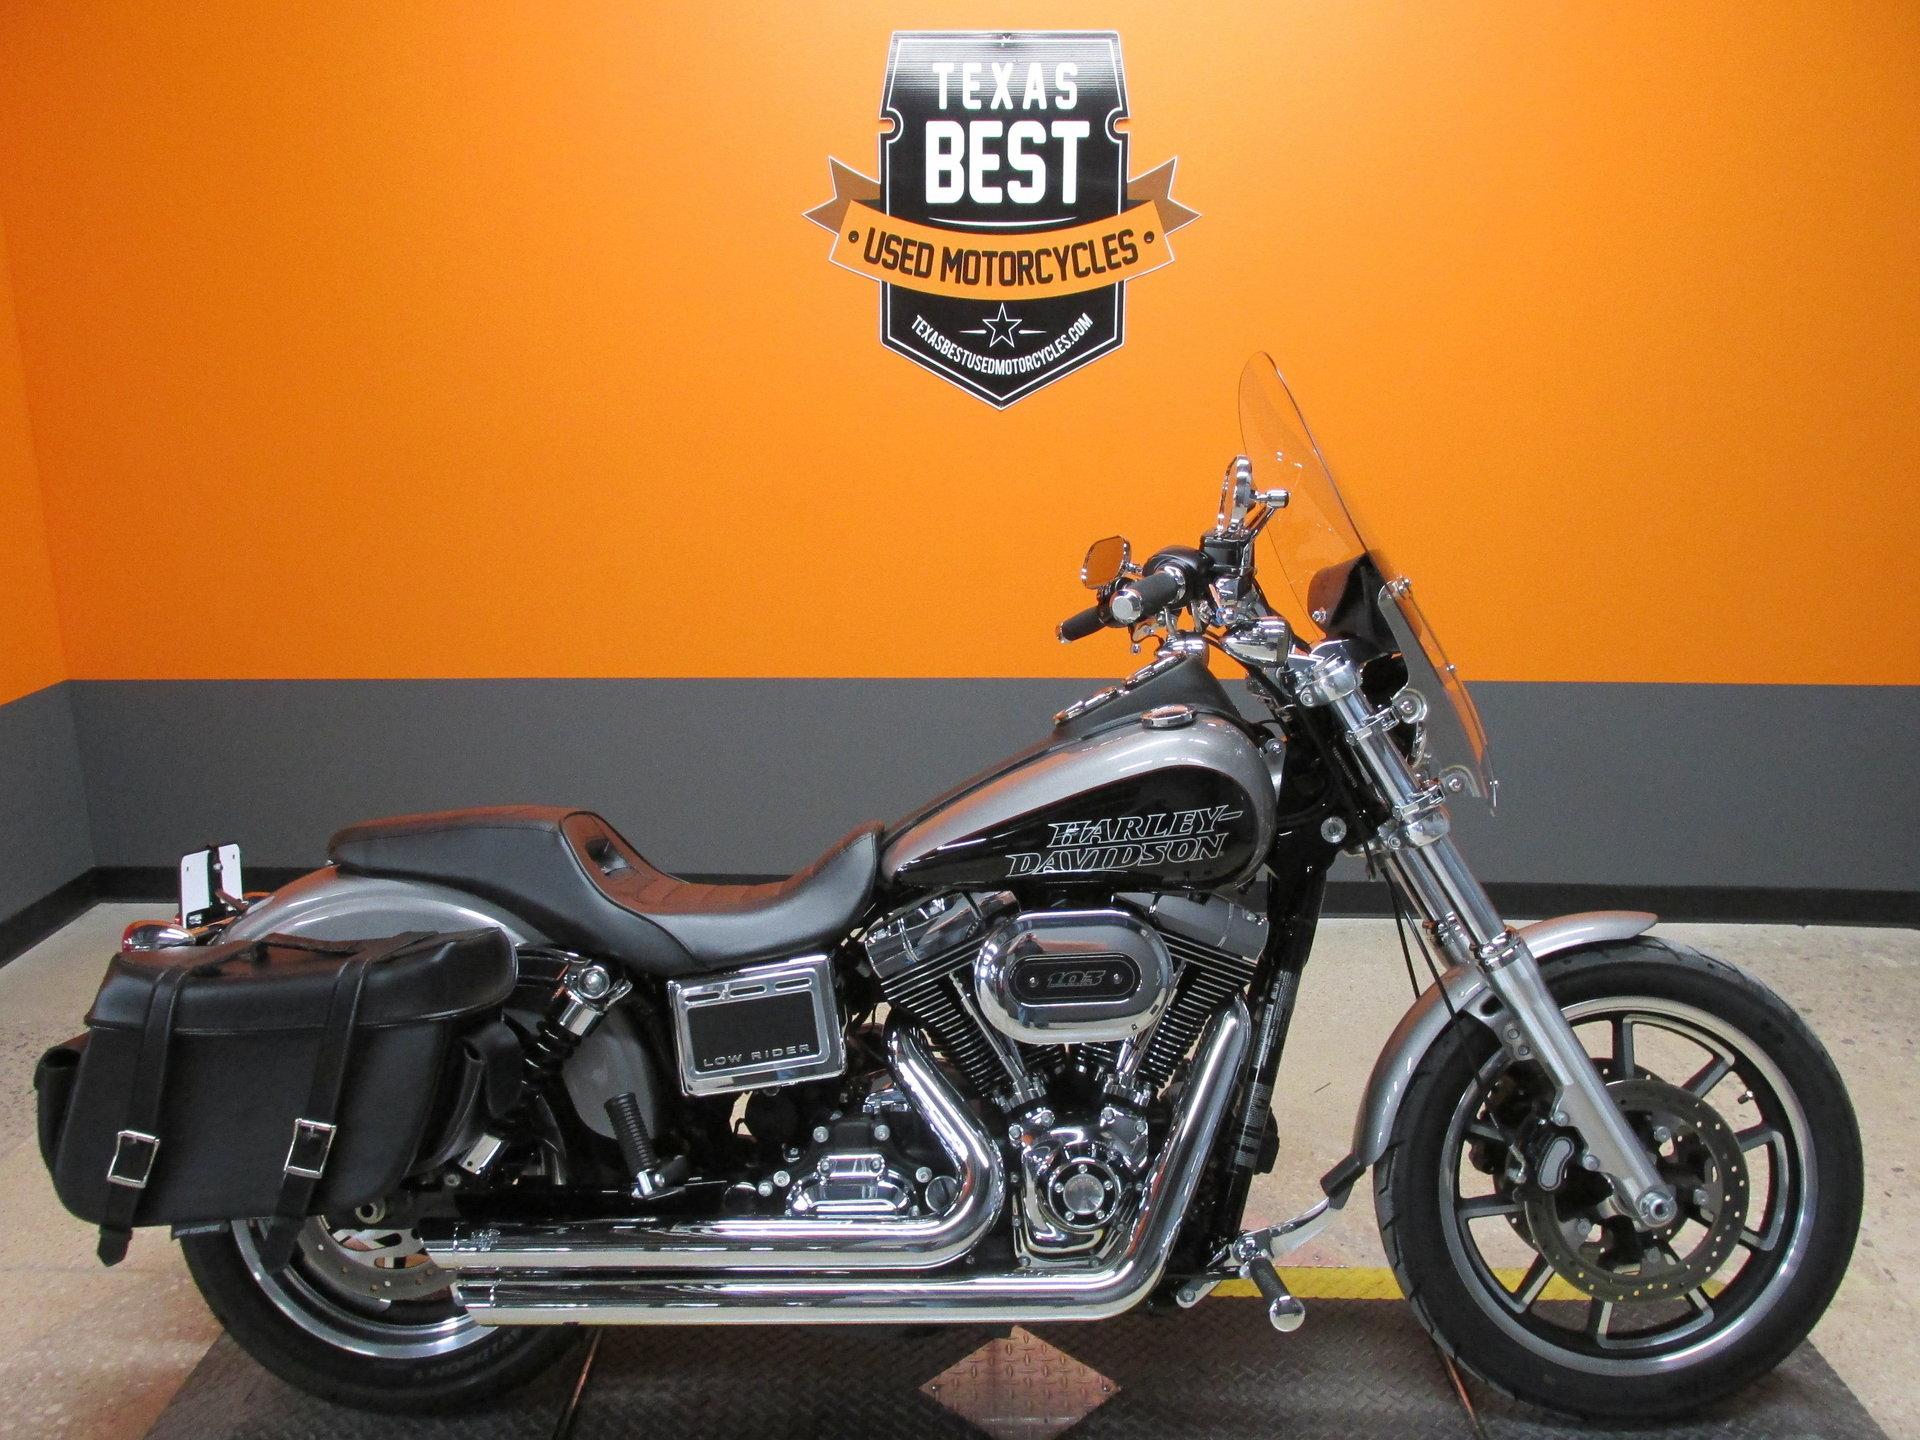 2016 Harley Davidson Dyna Low Rideramerican Motorcycle